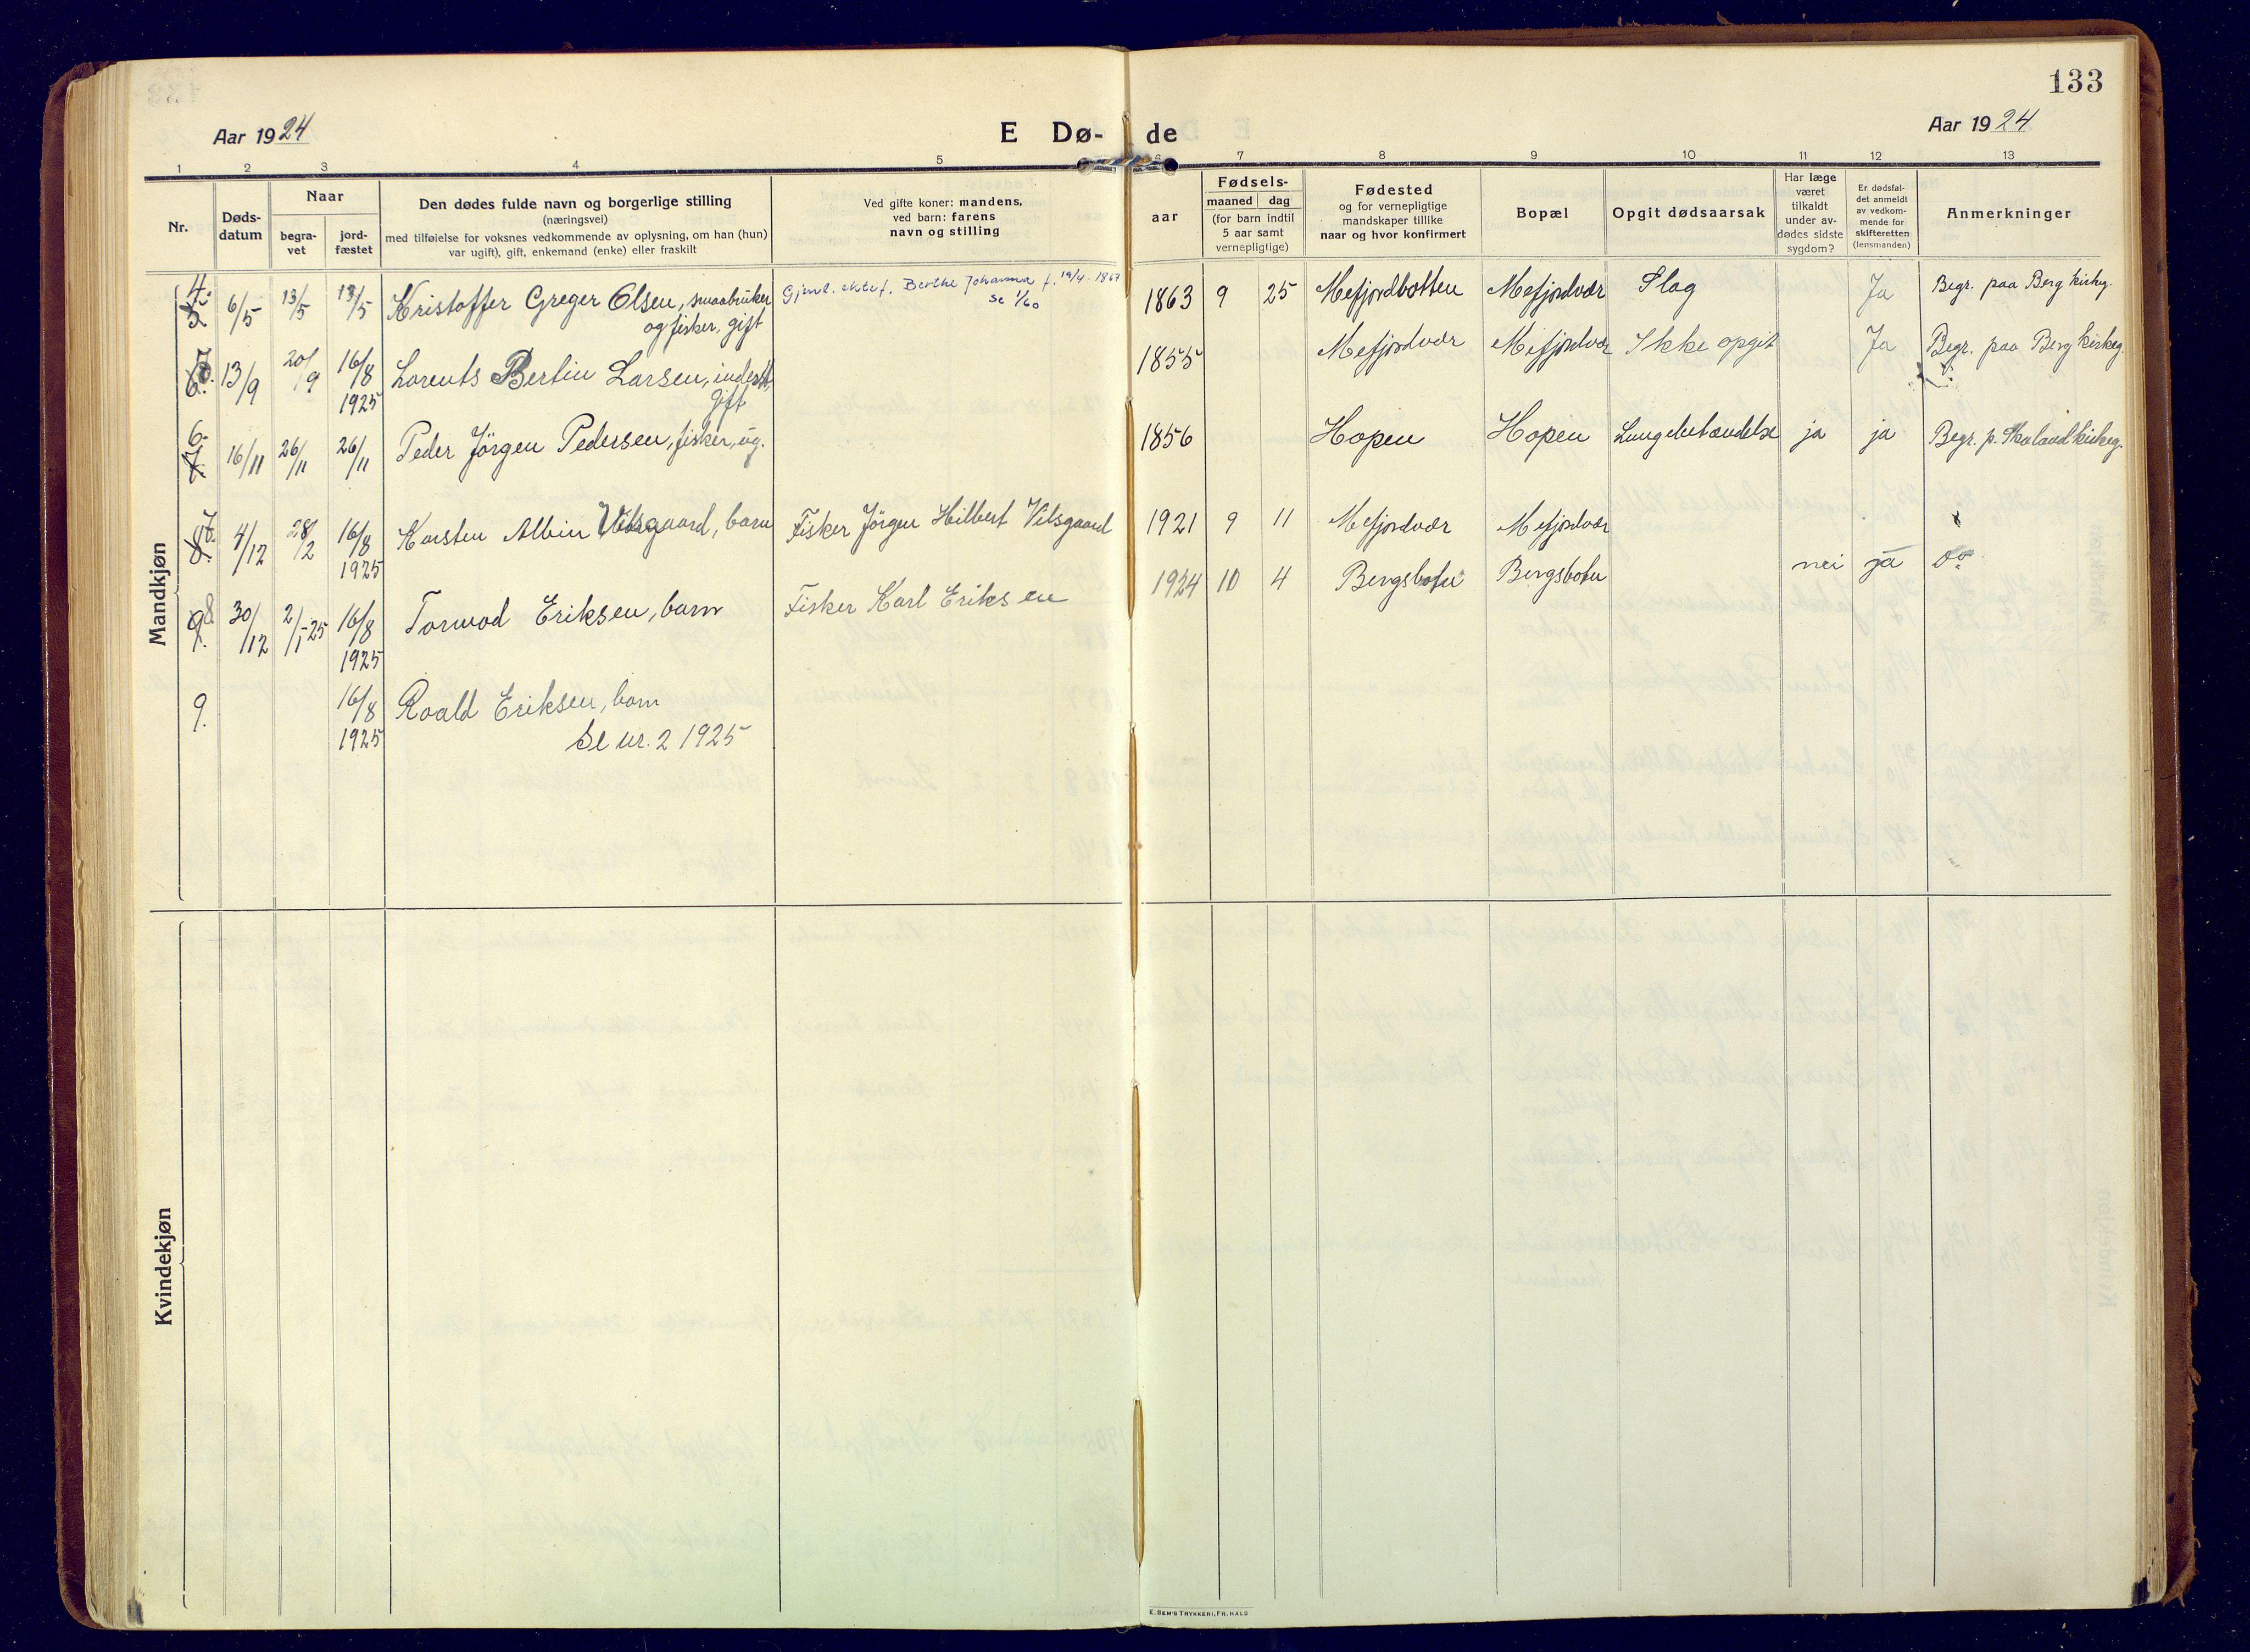 SATØ, Mefjord/Berg sokneprestkontor, G/Ga/Gaa: Ministerialbok nr. 9, 1916-1928, s. 133